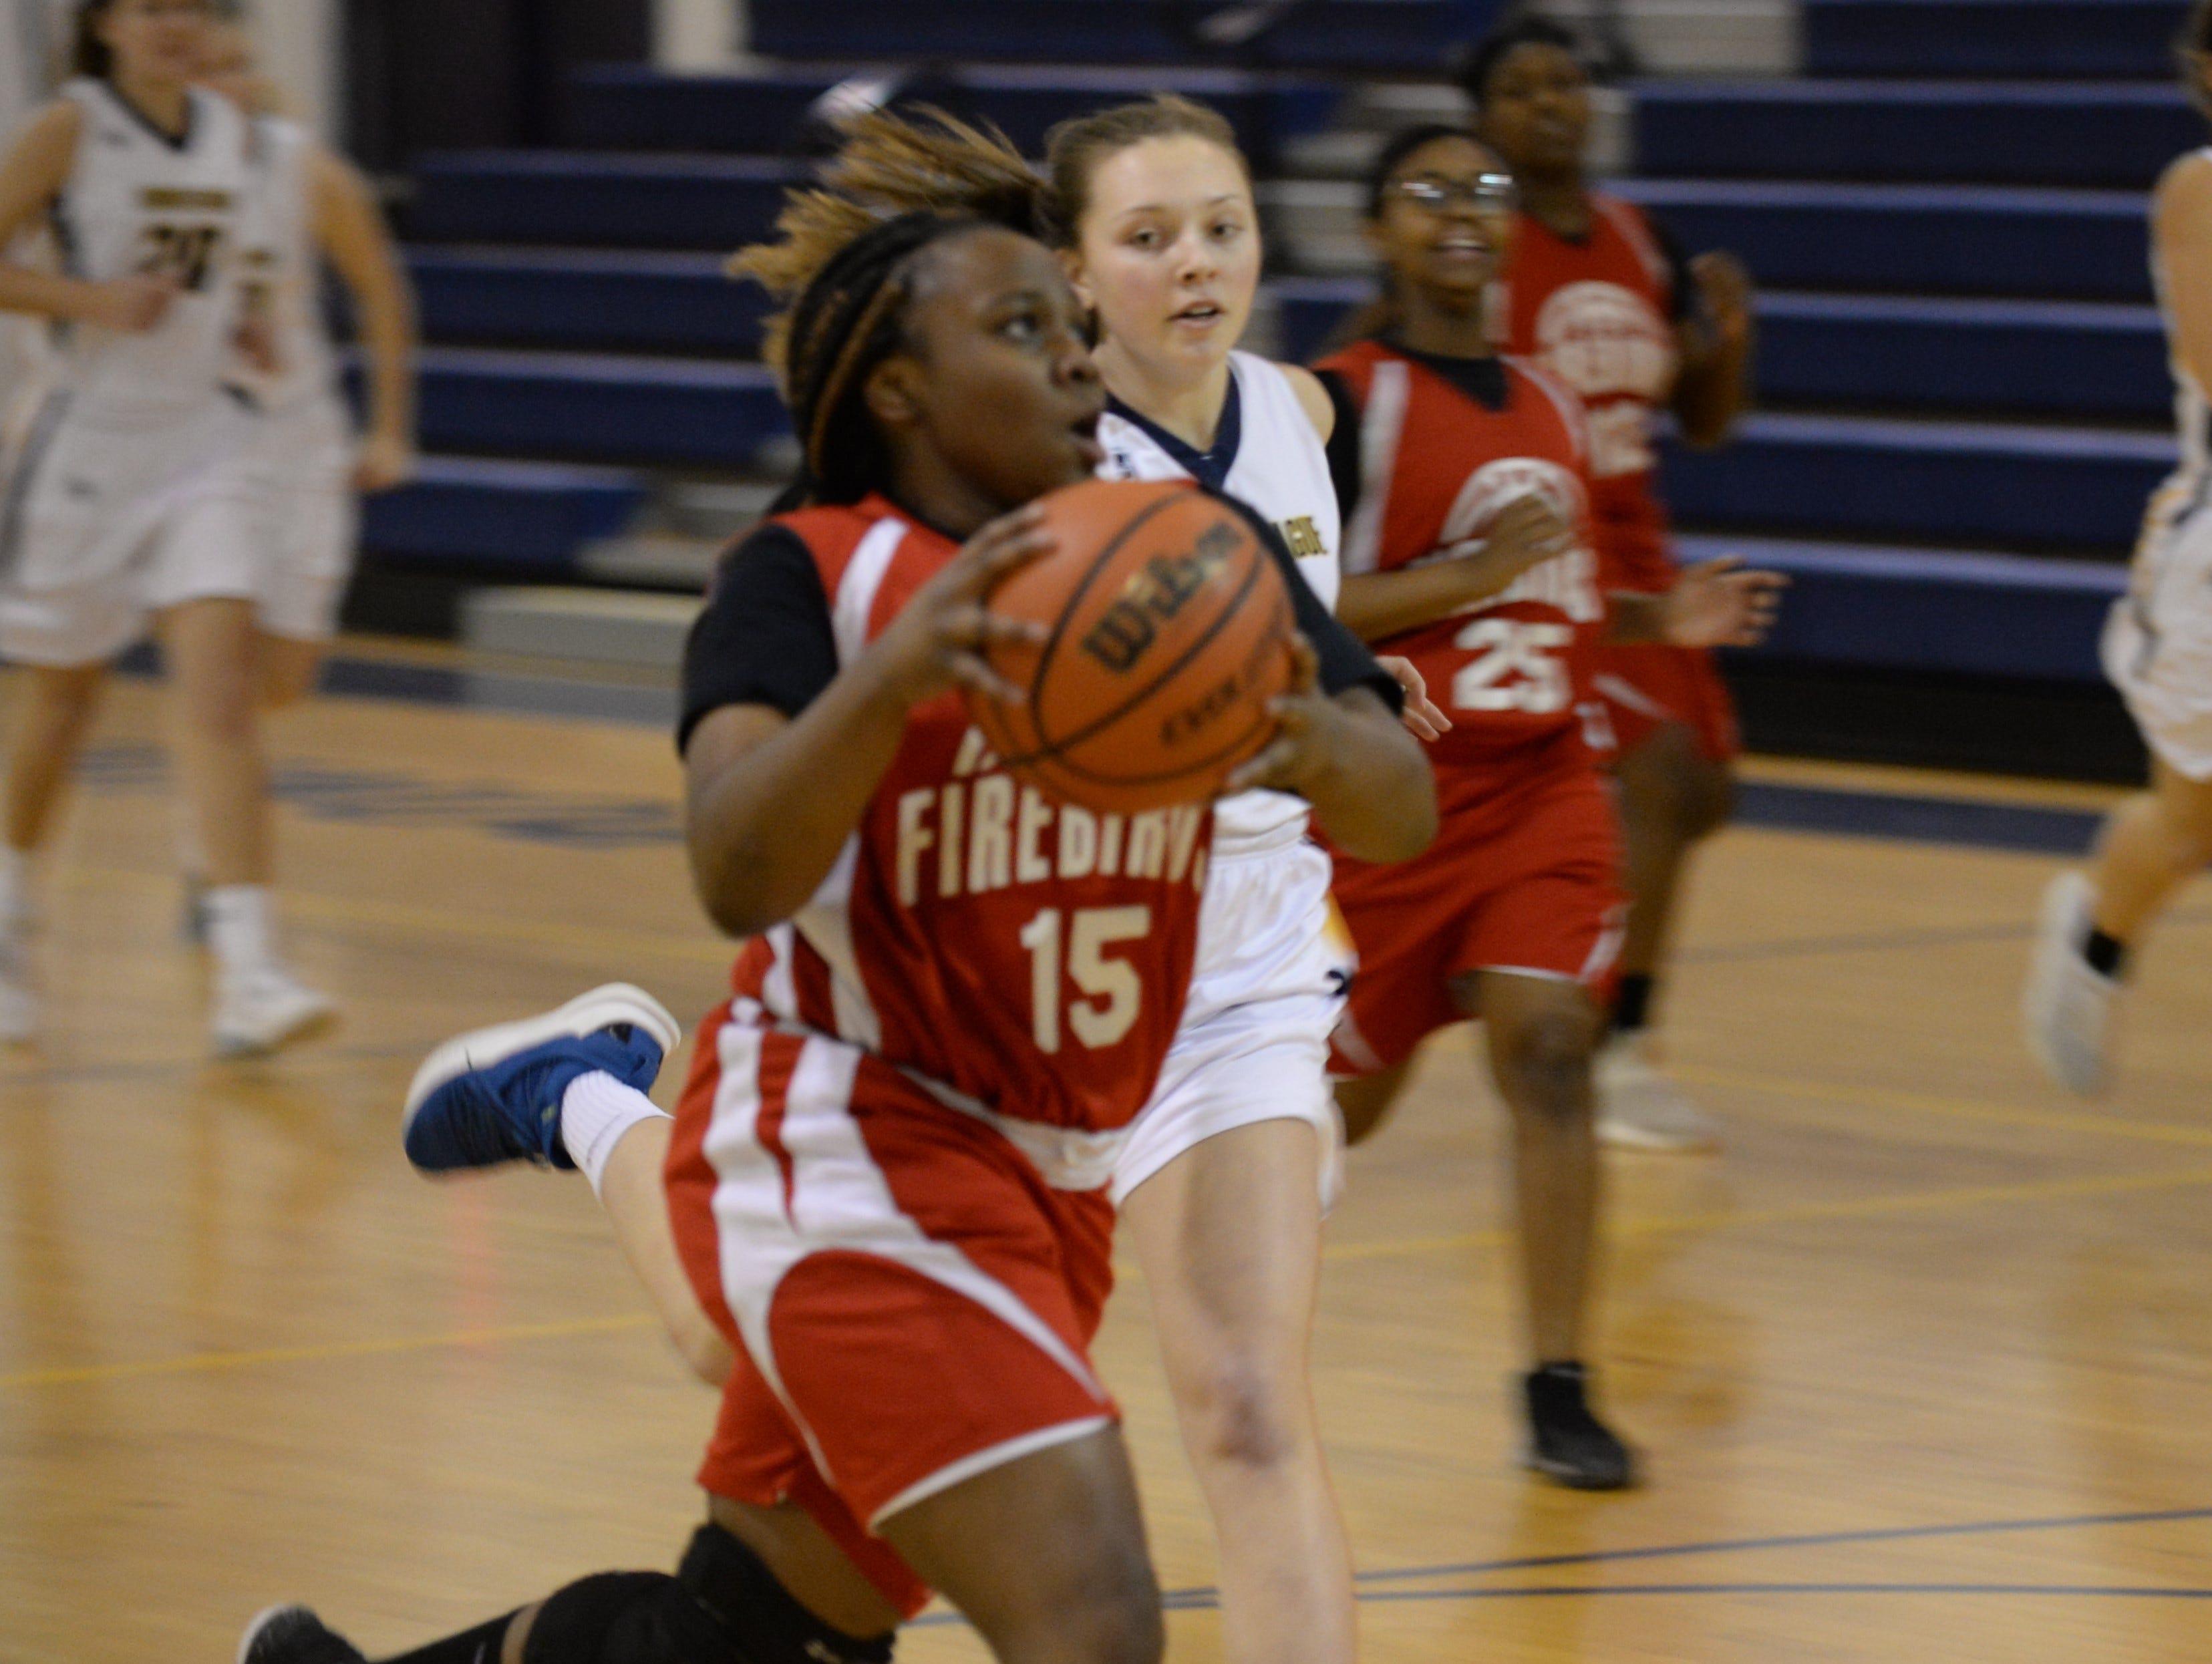 Arcadia's Kaylah Wharton drives to the basketball against Chincoteague on Thursday, Jan. 17, 2019.